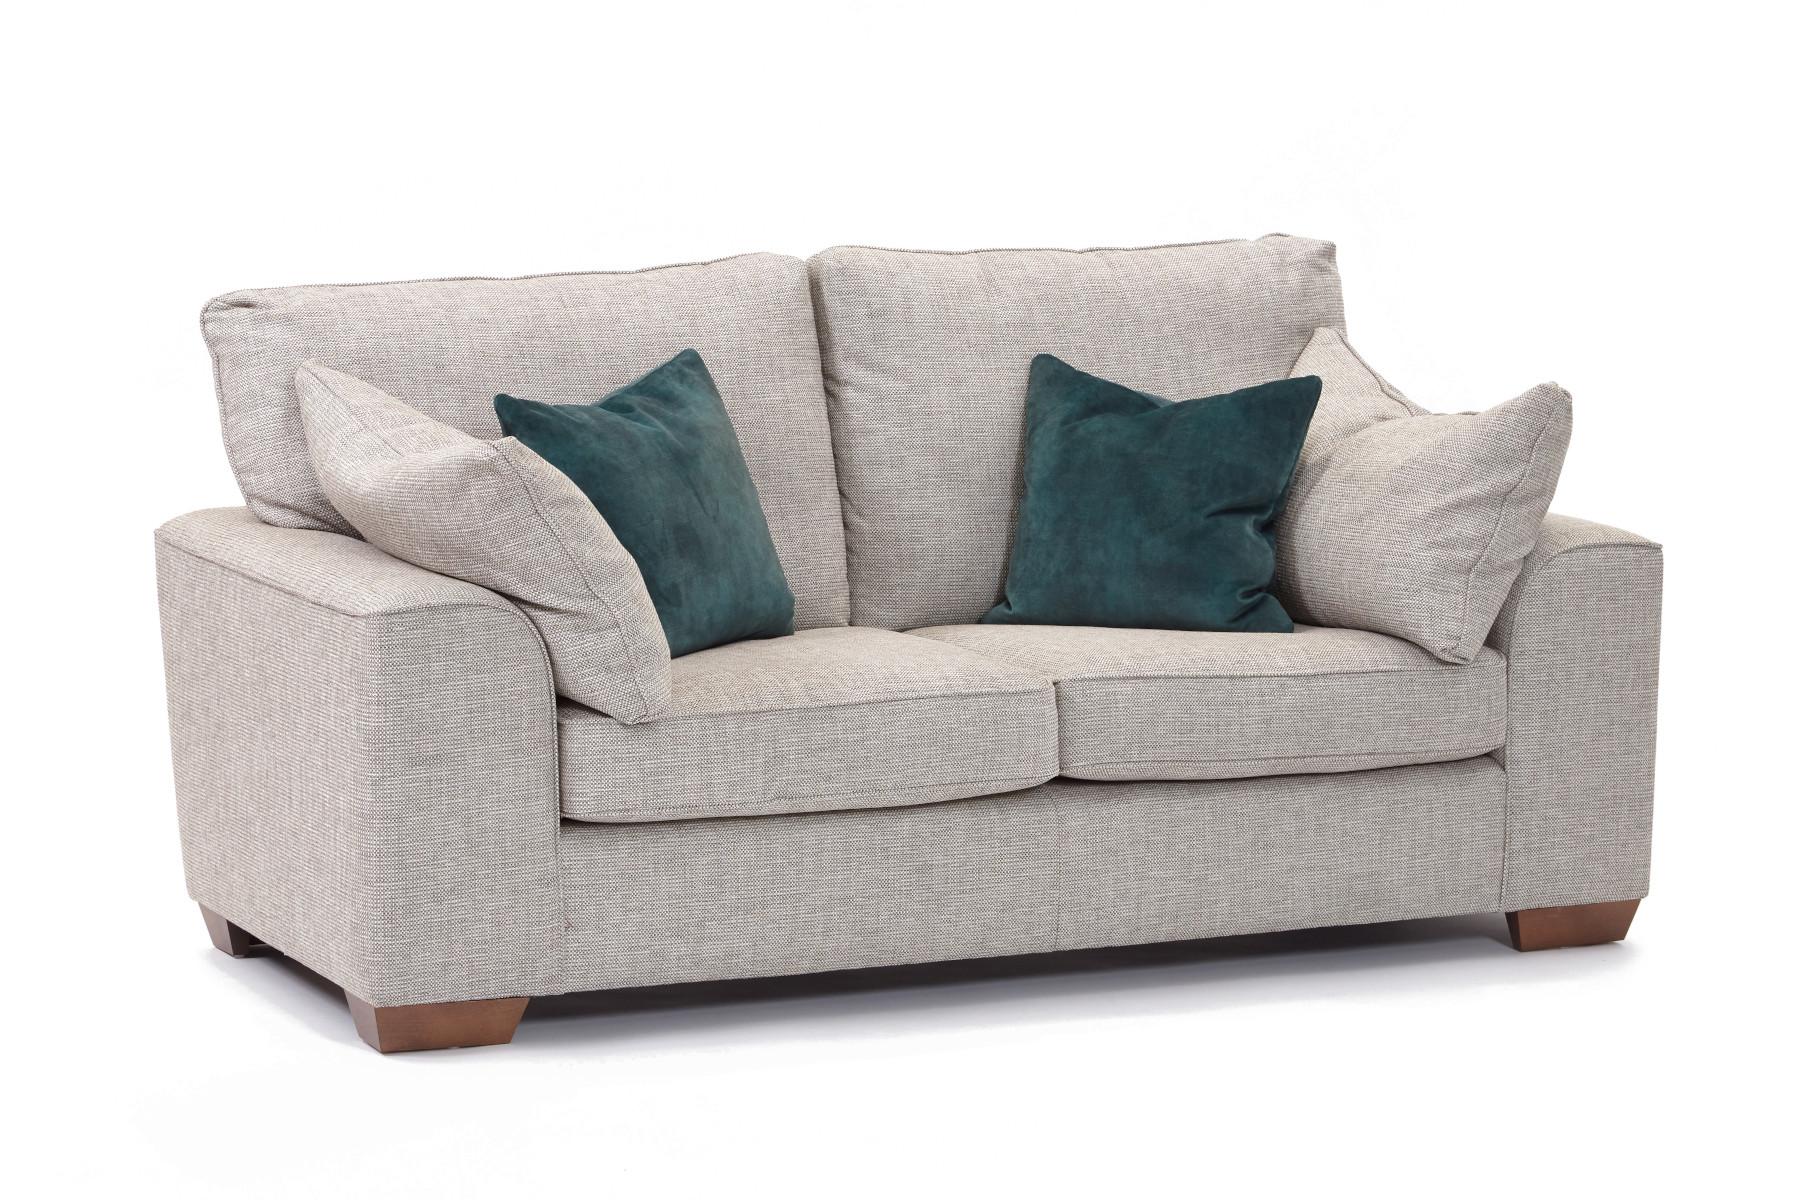 Presley Large Sofa